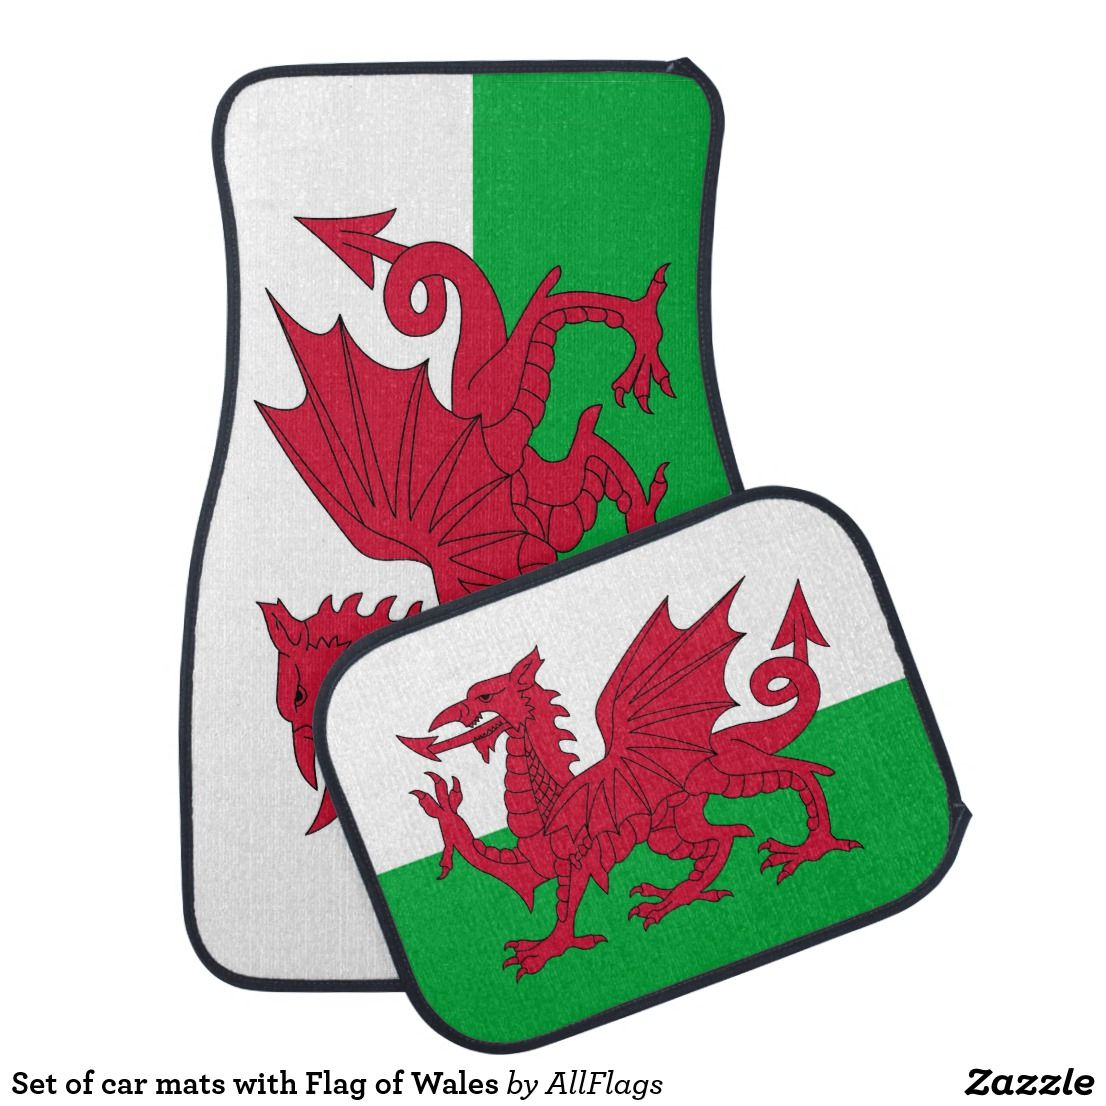 Welsh Dragon Decal For Car Van Bike Laptop Tablet Stickers Cymru Wales X 2 New Desktop Computers Hdmi Ssd [ 830 x 1000 Pixel ]